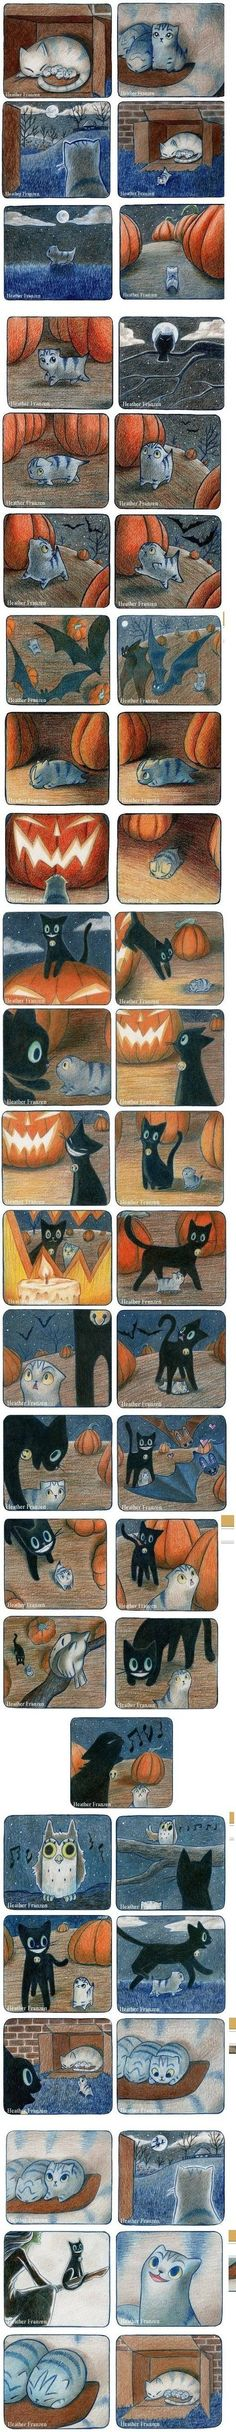 Heather Franzen - adorable comic for Halloween! Black cat...